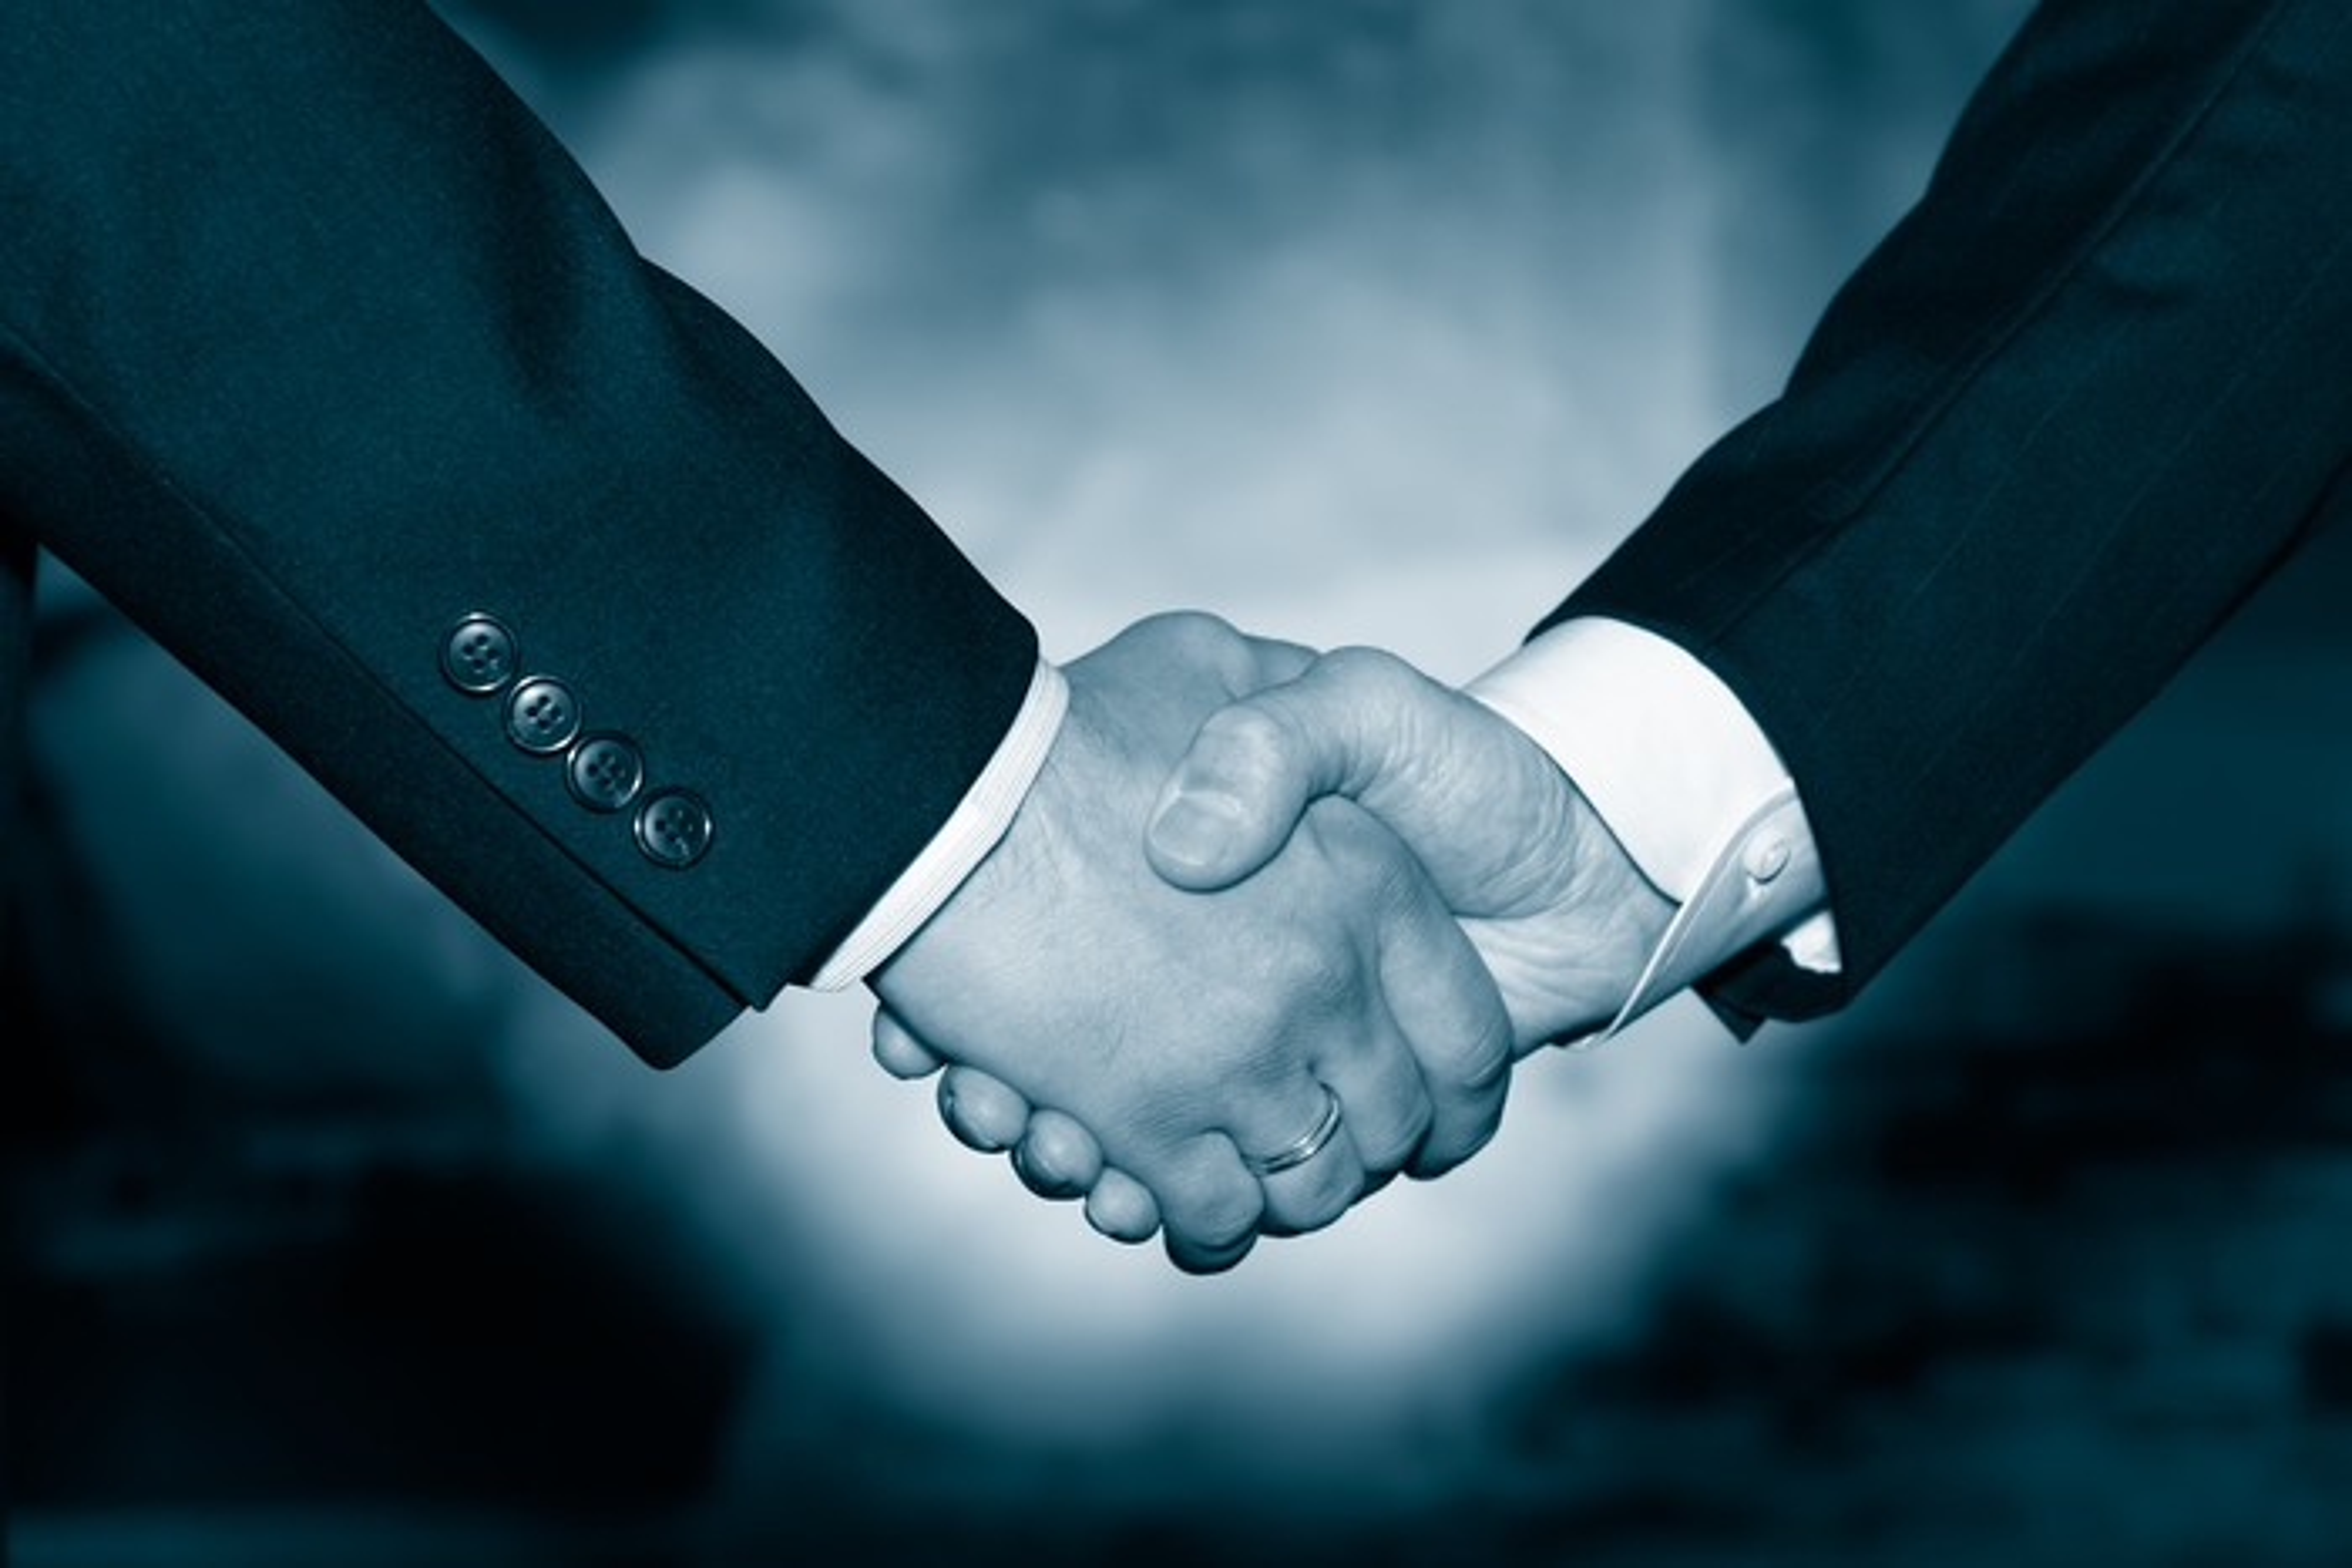 Two businessmen shaking hands, symbolizing a merger.